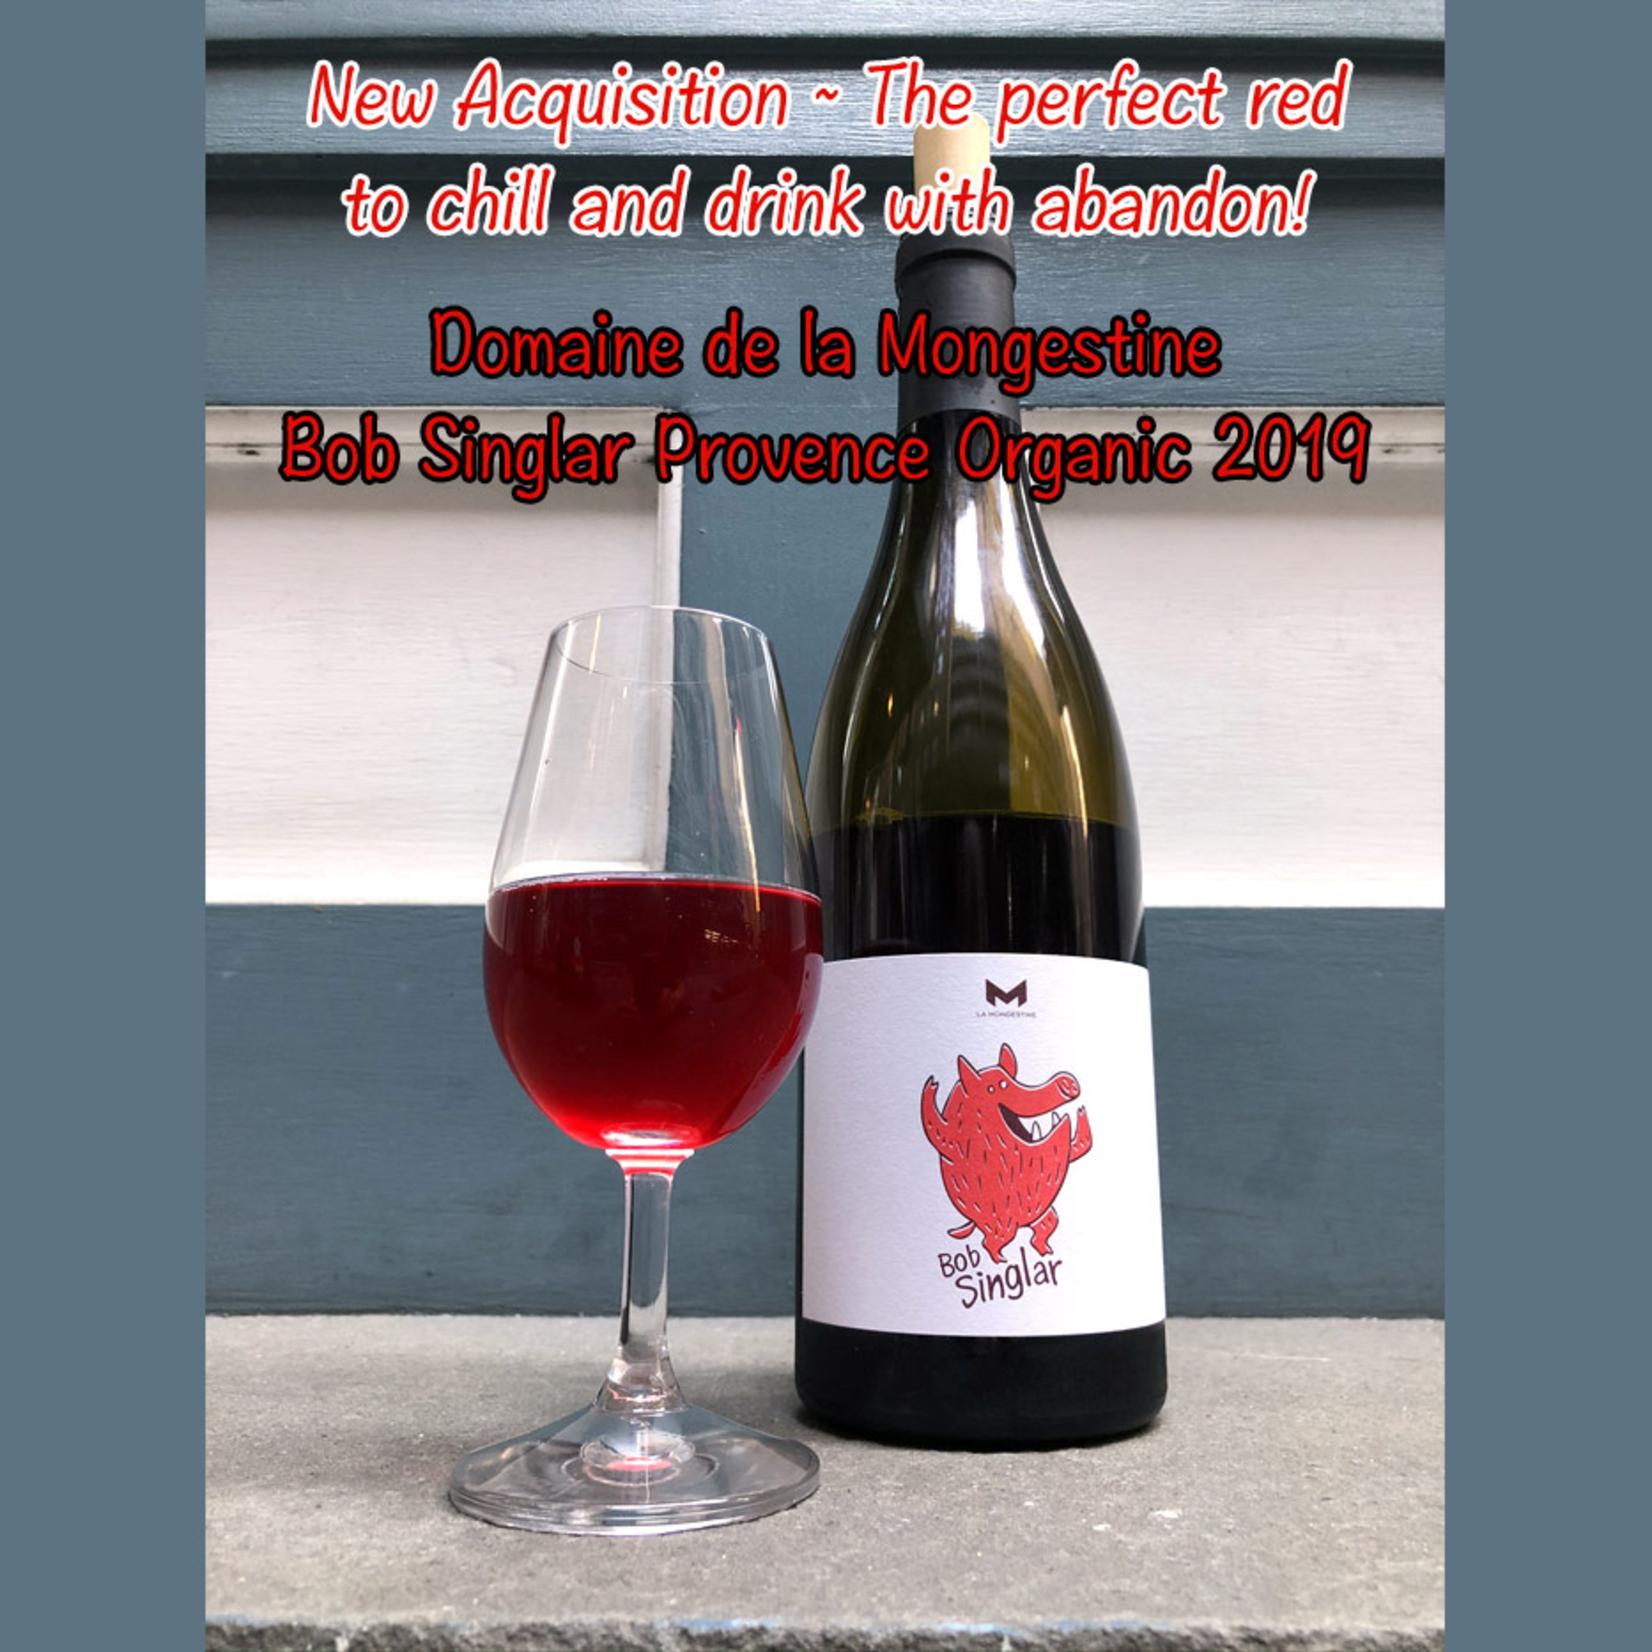 Wine Domaine de la Mongestine Bob Singlar Provence Organic